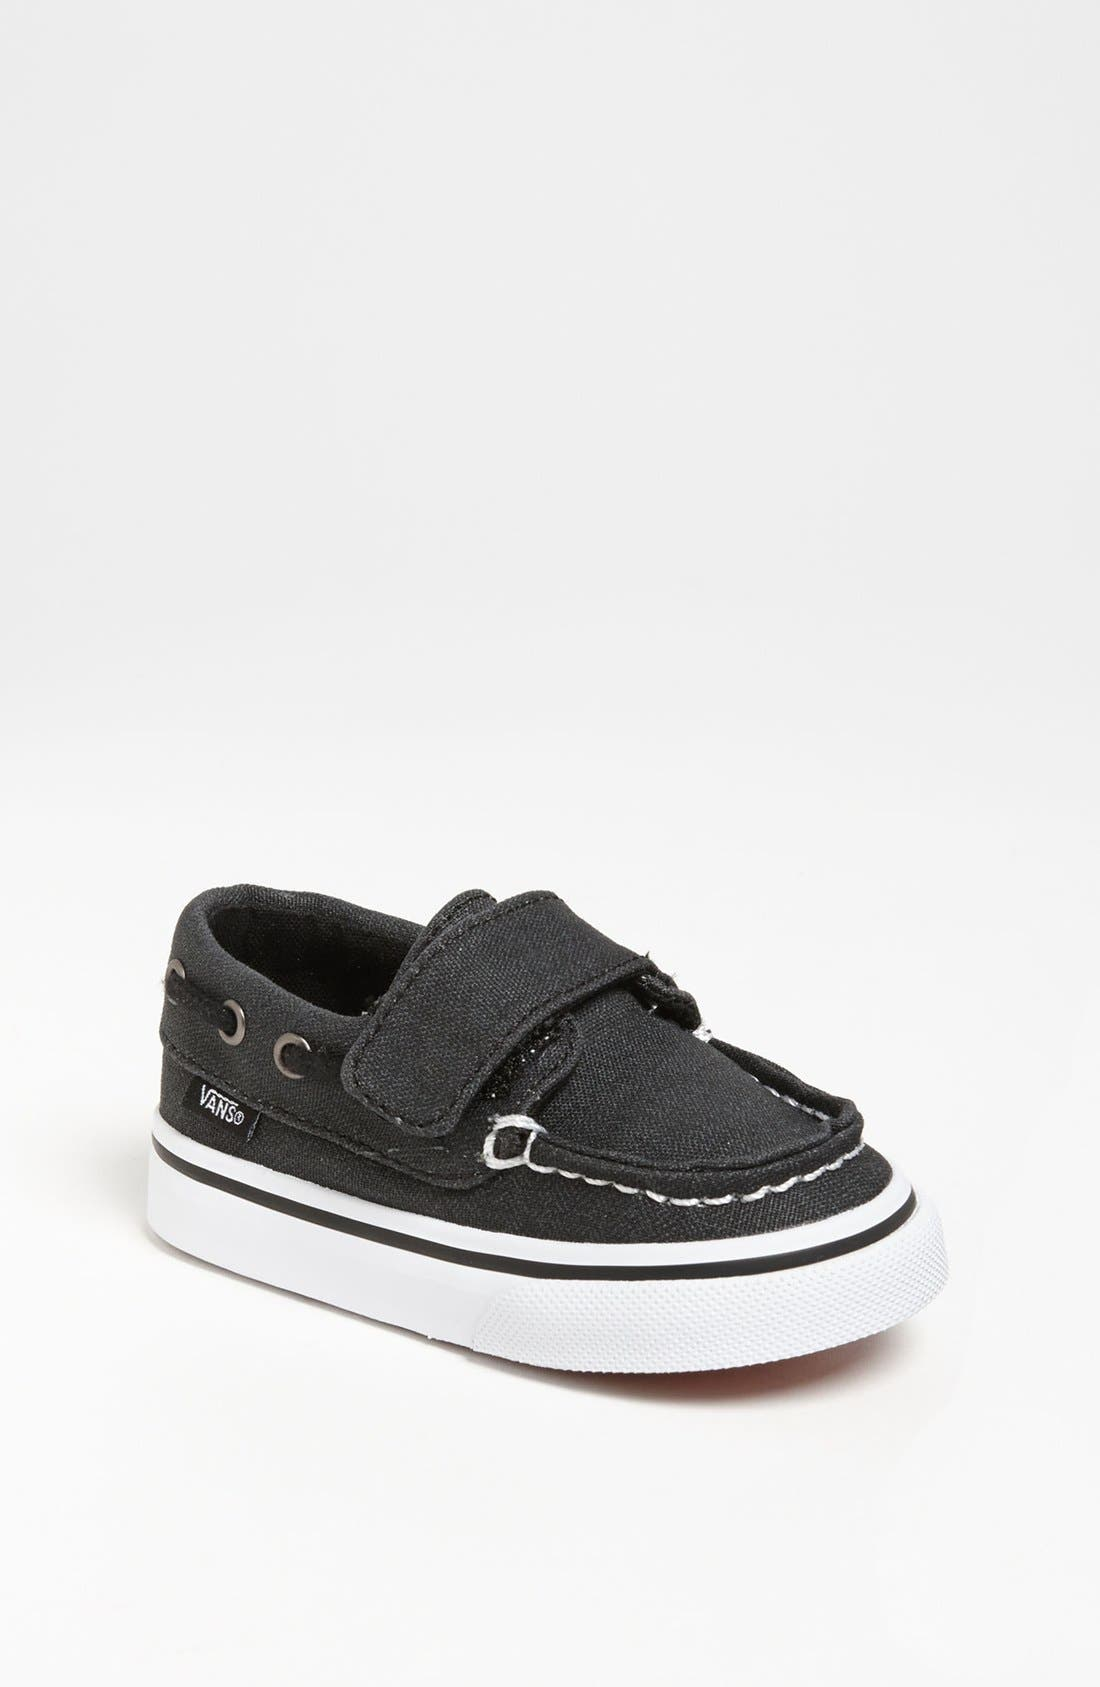 Main Image - Vans 'Zapato Del Barco' Sneaker (Baby, Walker & Toddler)